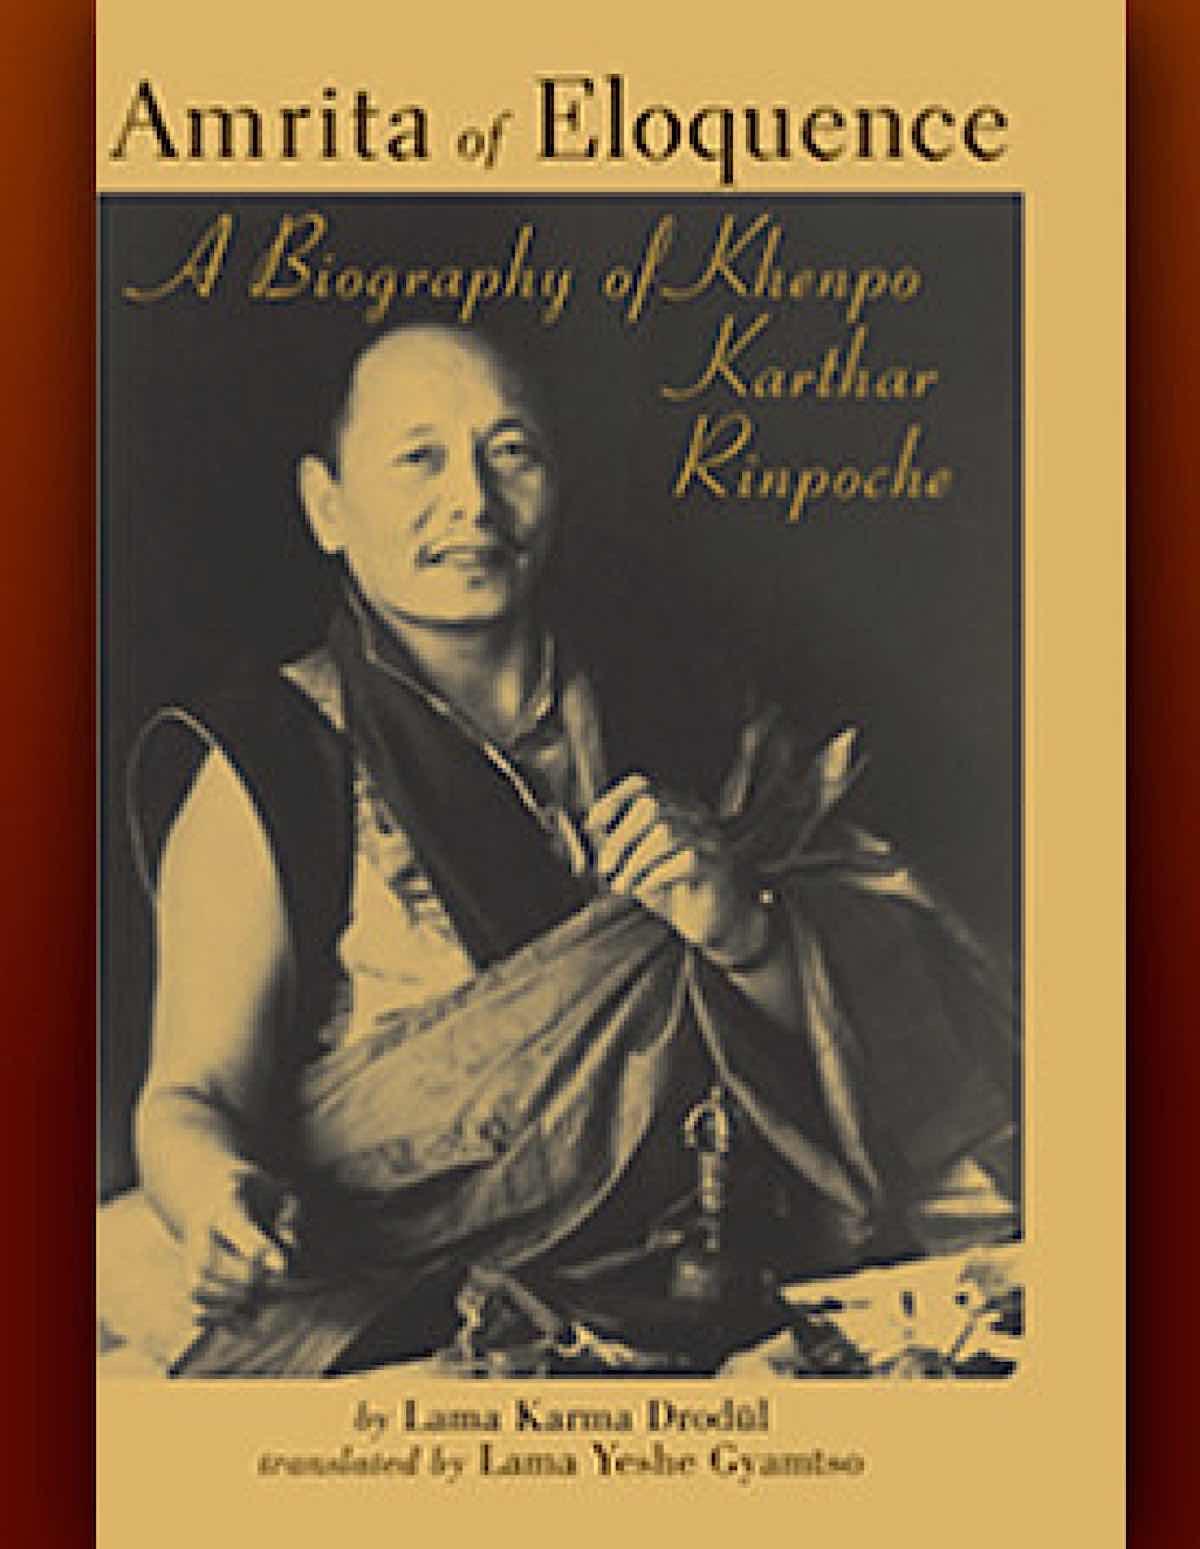 Buddha Weekly cover Amrita of Eloquence Khenpo Kathar Rinpoche Buddhism